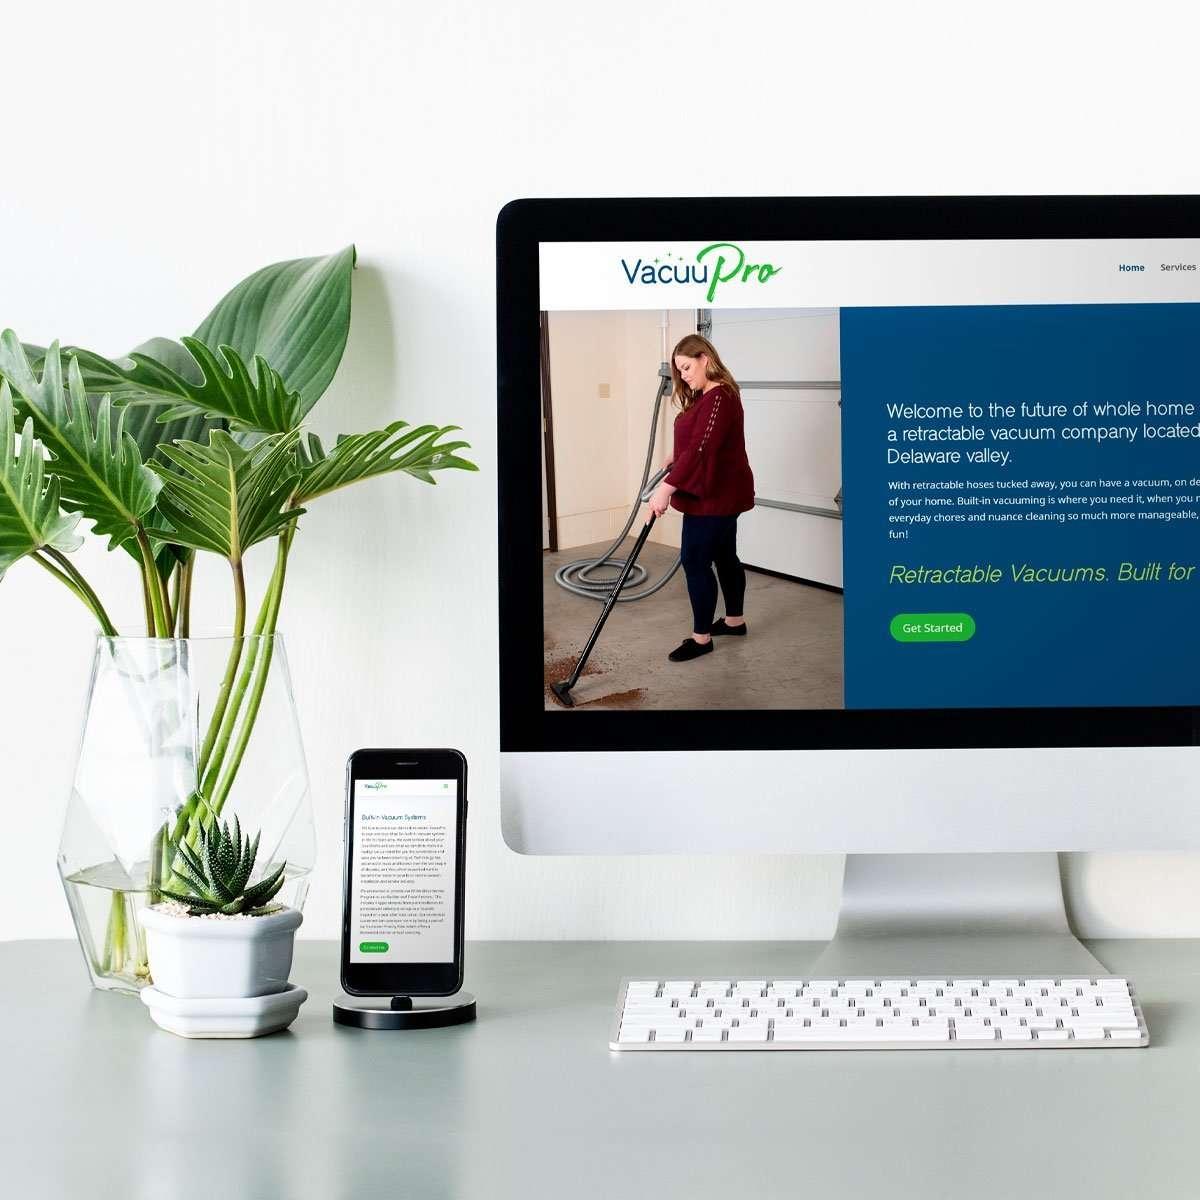 VacuuPro Web Design by BrandSwan, a web design company